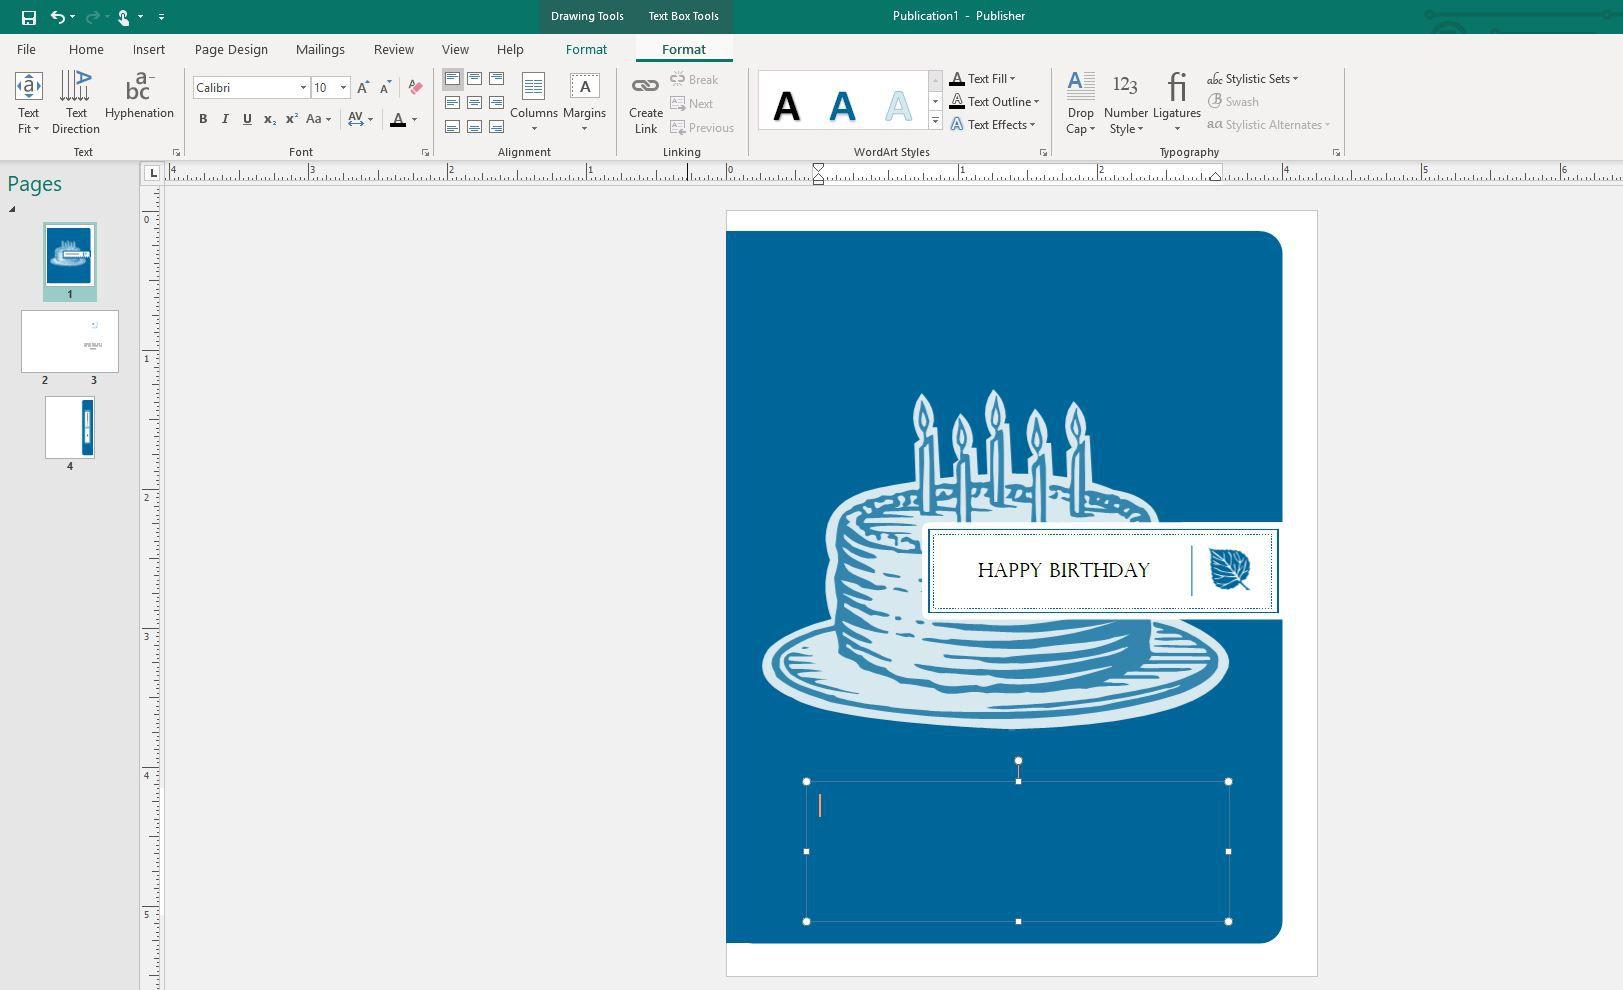 Format menu in Publisher